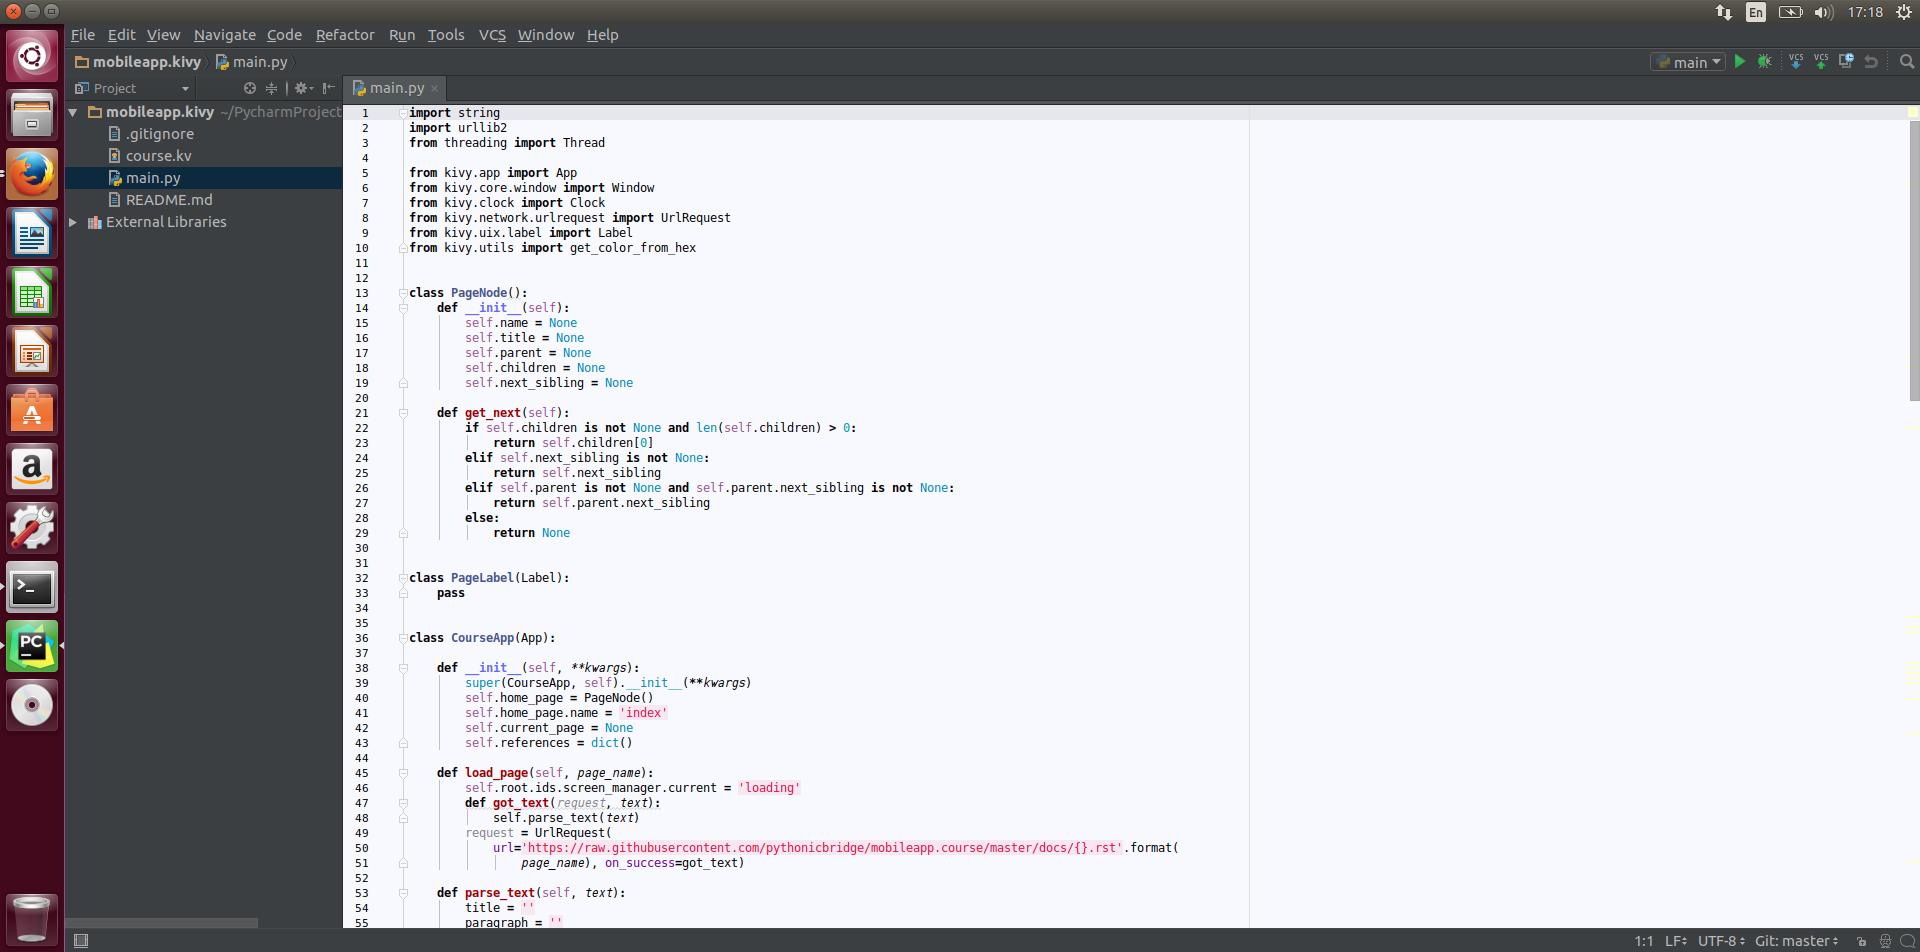 Working with Pycharm IDE, Git, and Kivy — Pythonic CS1